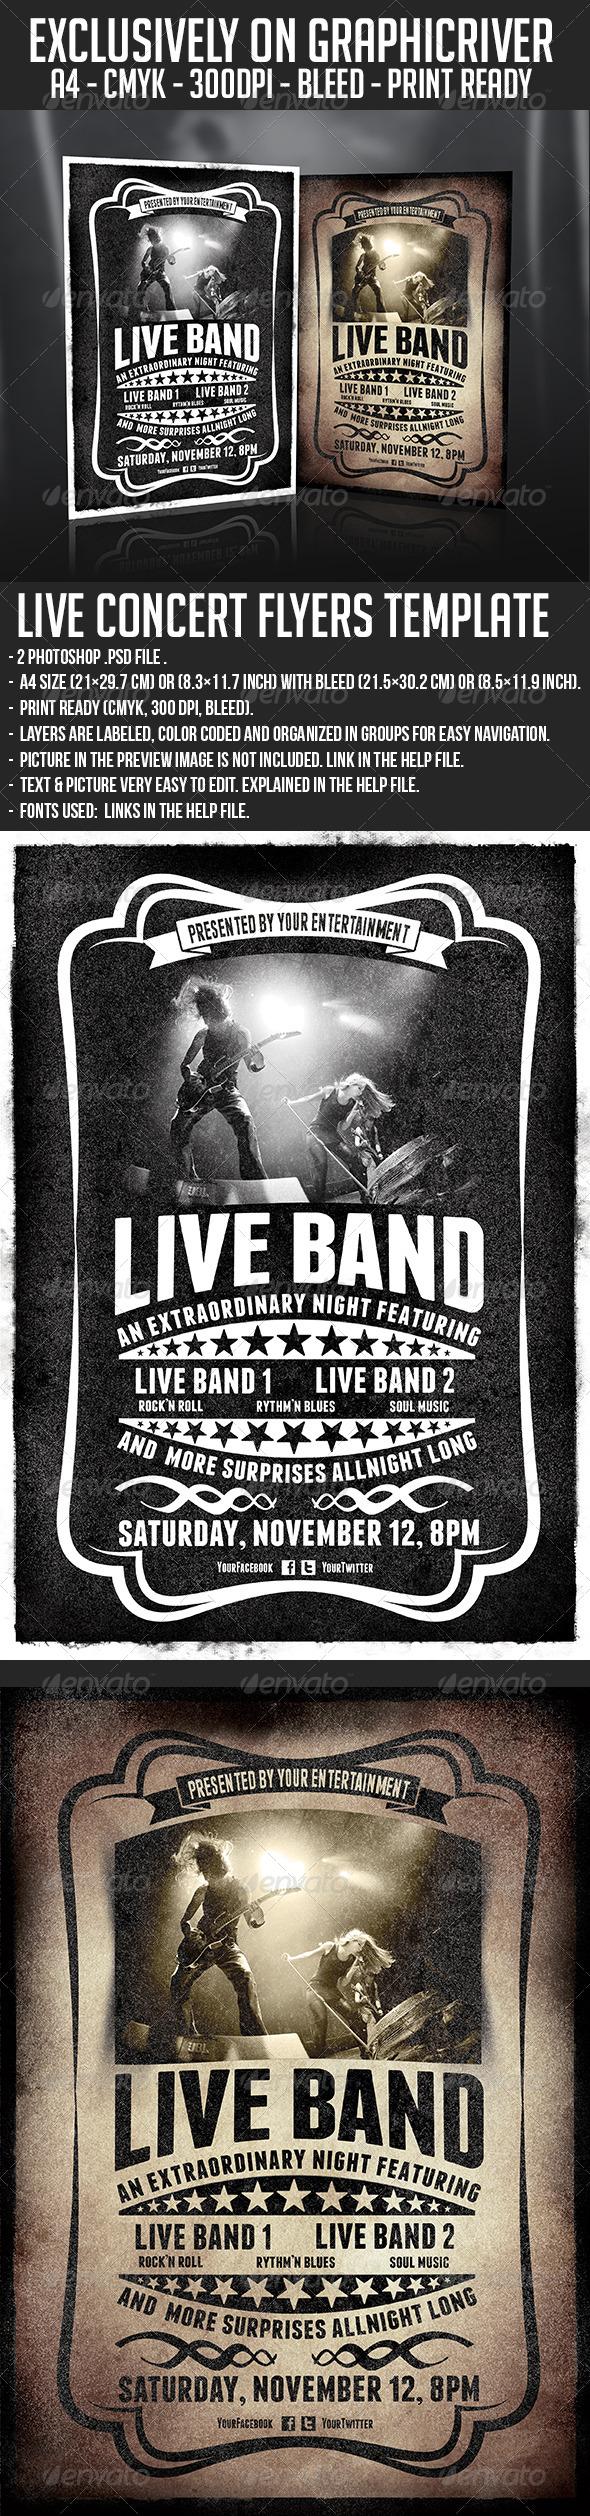 GraphicRiver Live Concert Flyer Templates 2x1 6107165